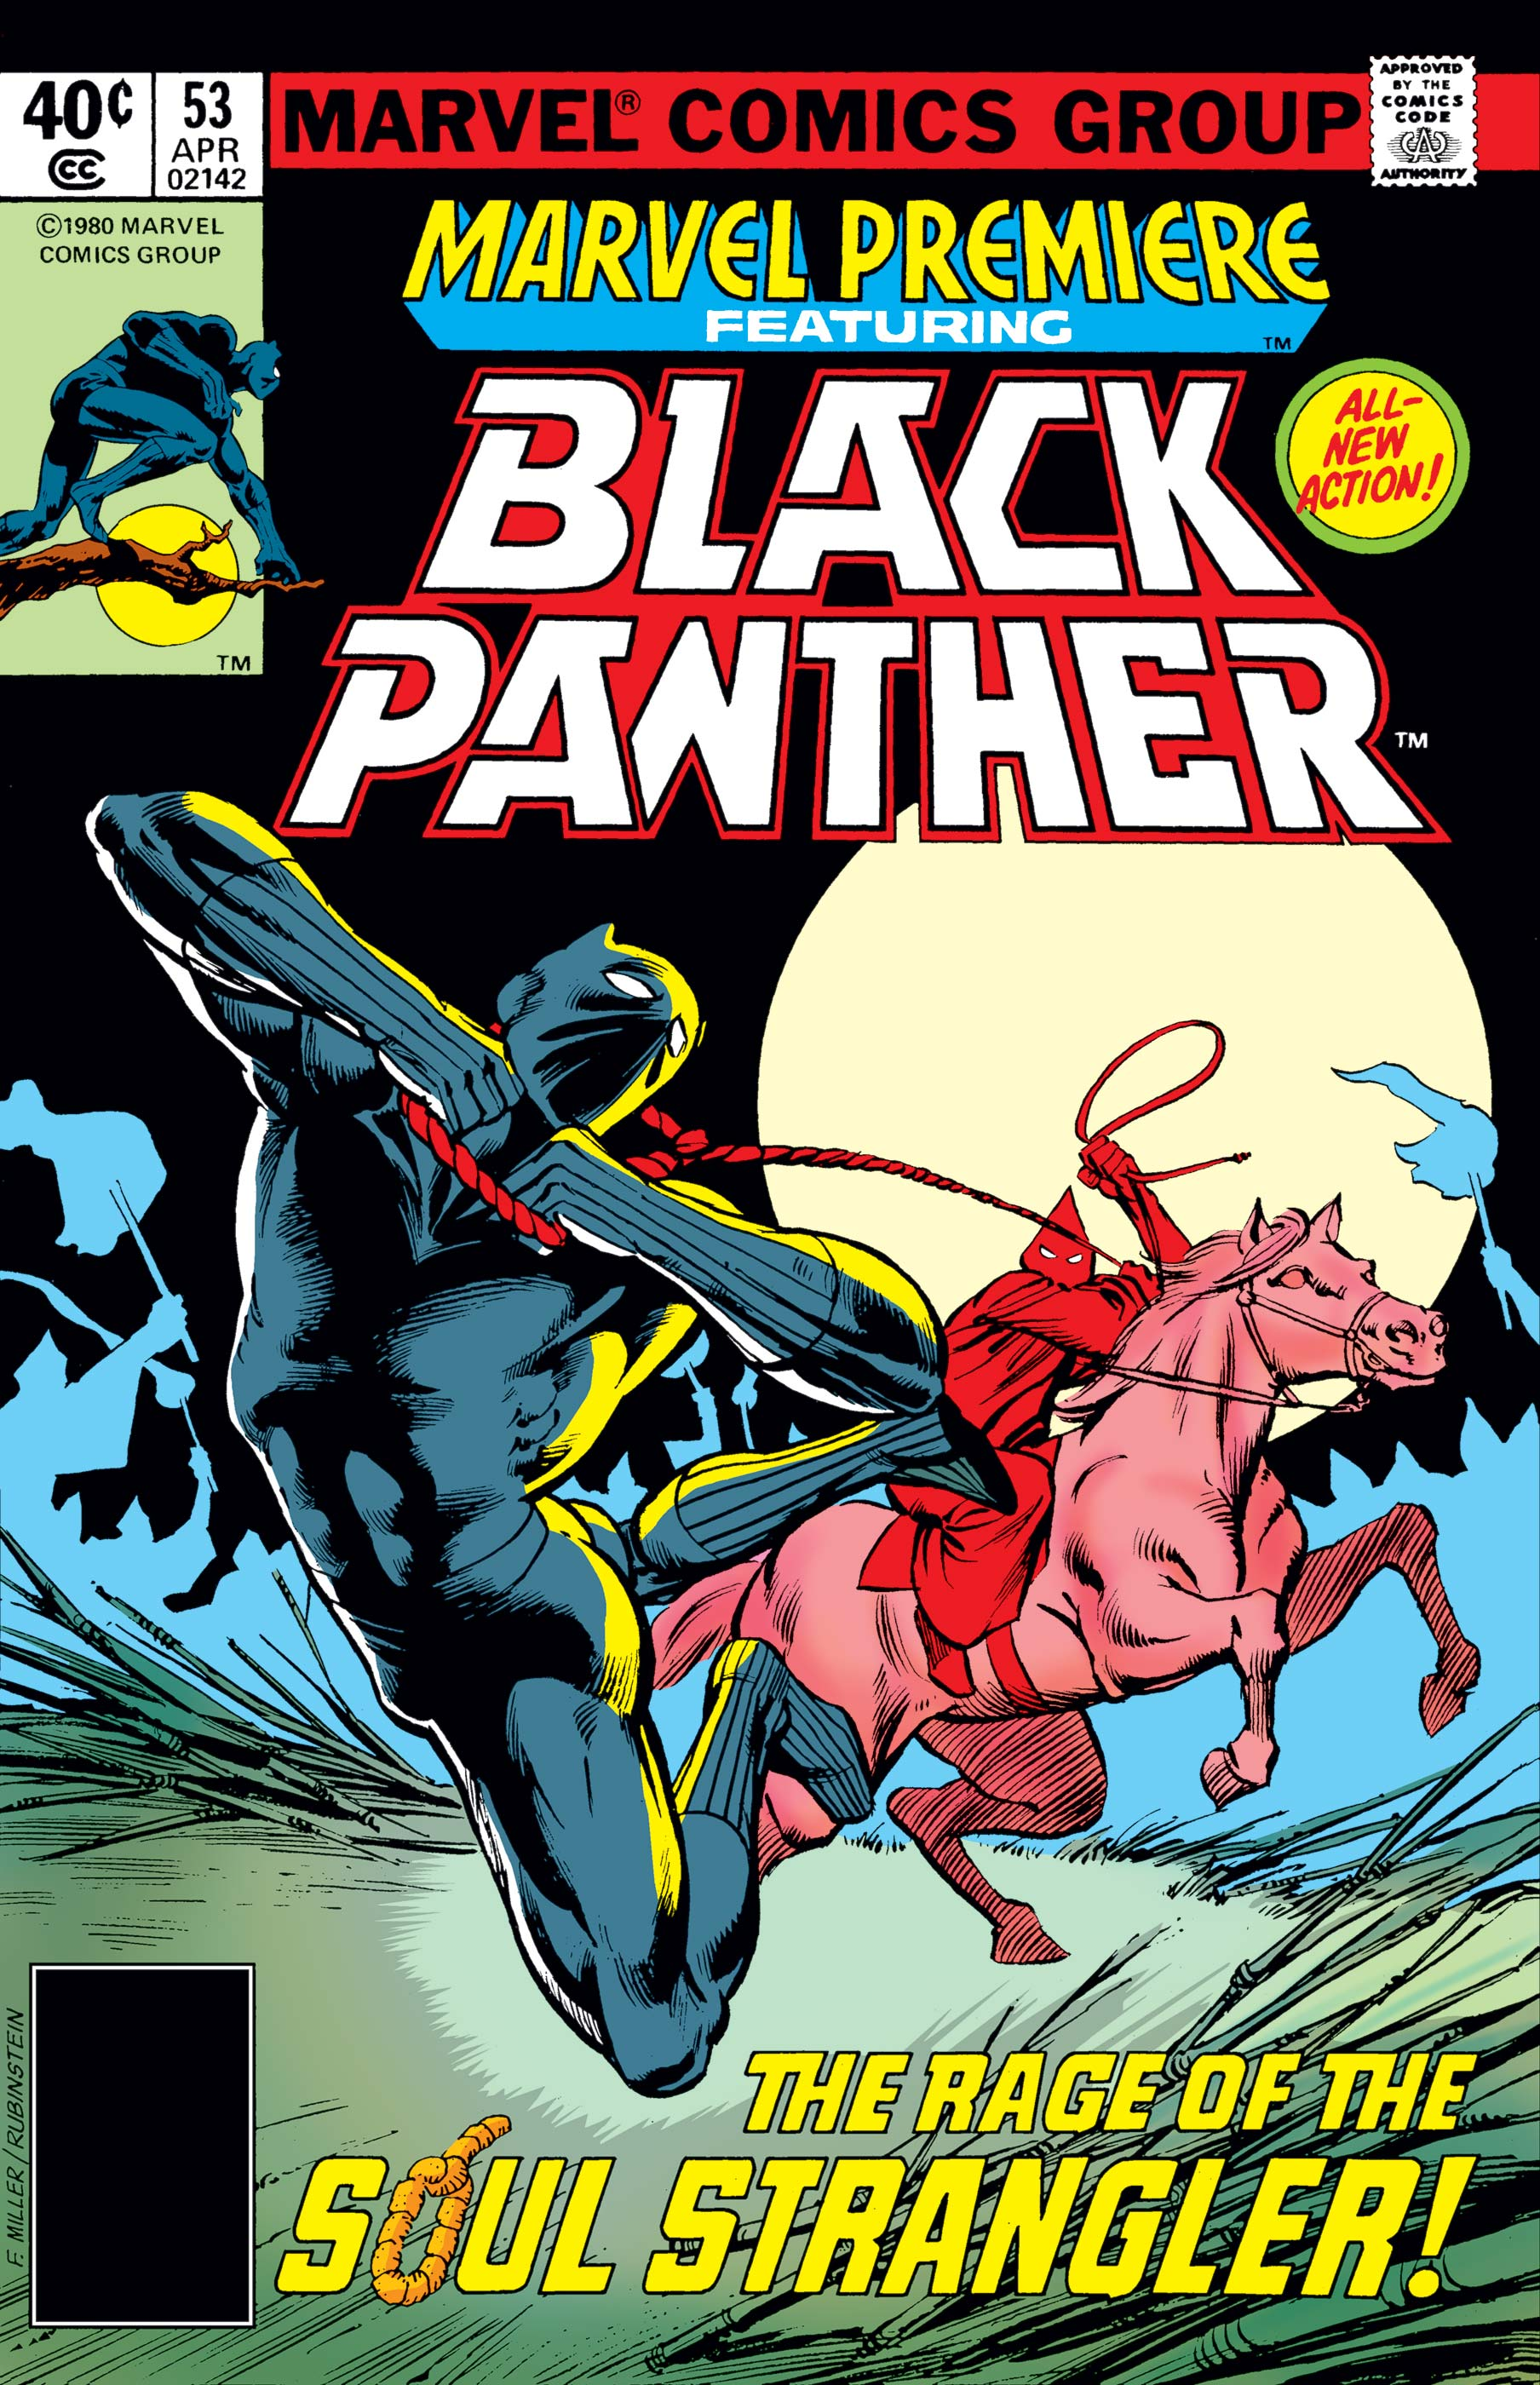 Marvel Premiere (1972) #53